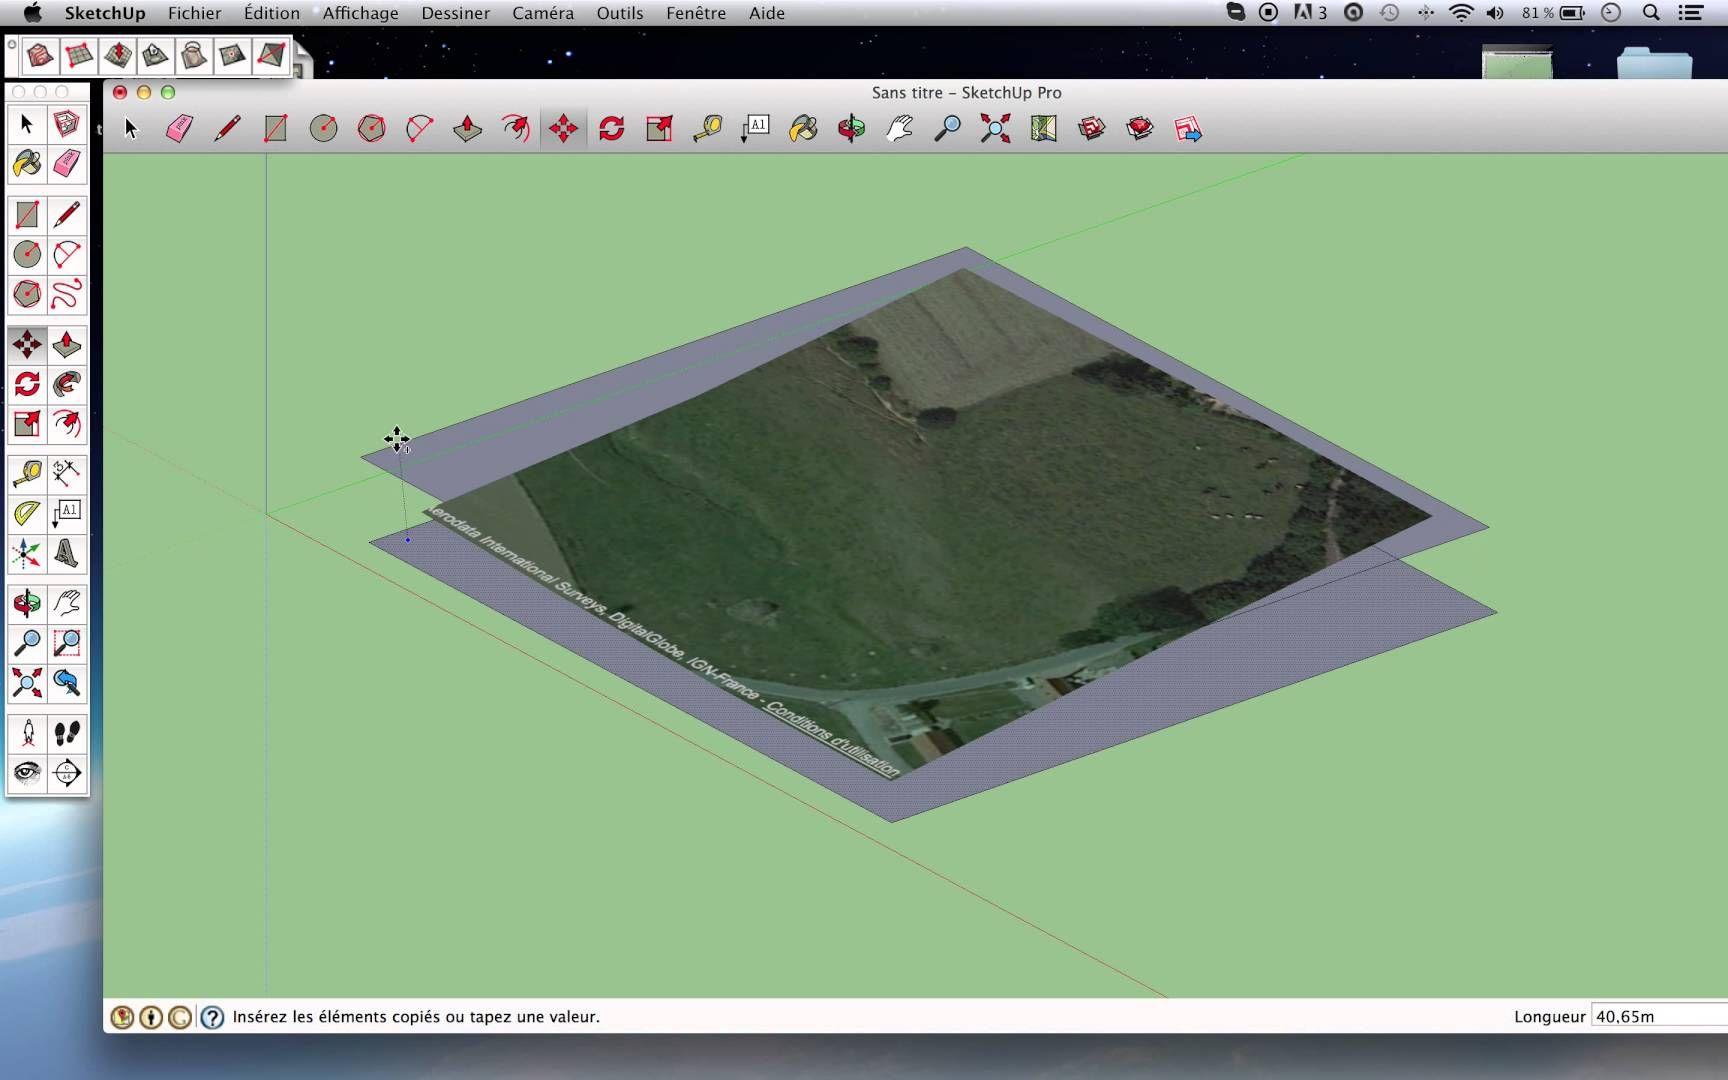 Tuto Sketchup - Modéliser un Terrain en 3D rapidement. ... Indeed.. it's quicker !!